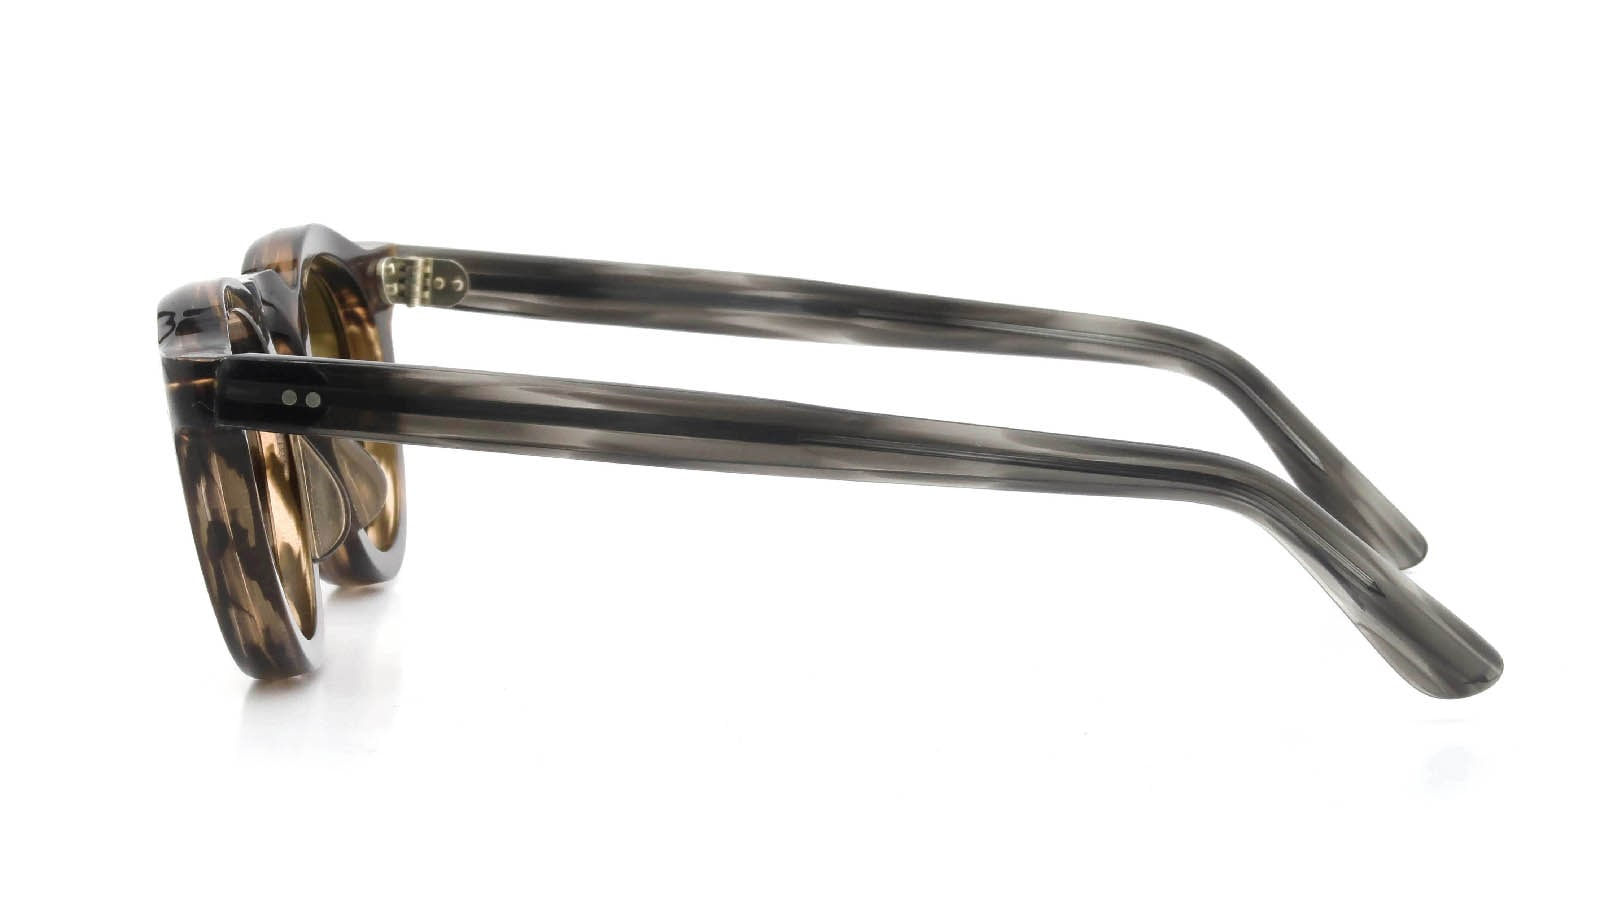 Lesca VINTAGE Panto Ash-Brown-sasa 8mm (v5) 3